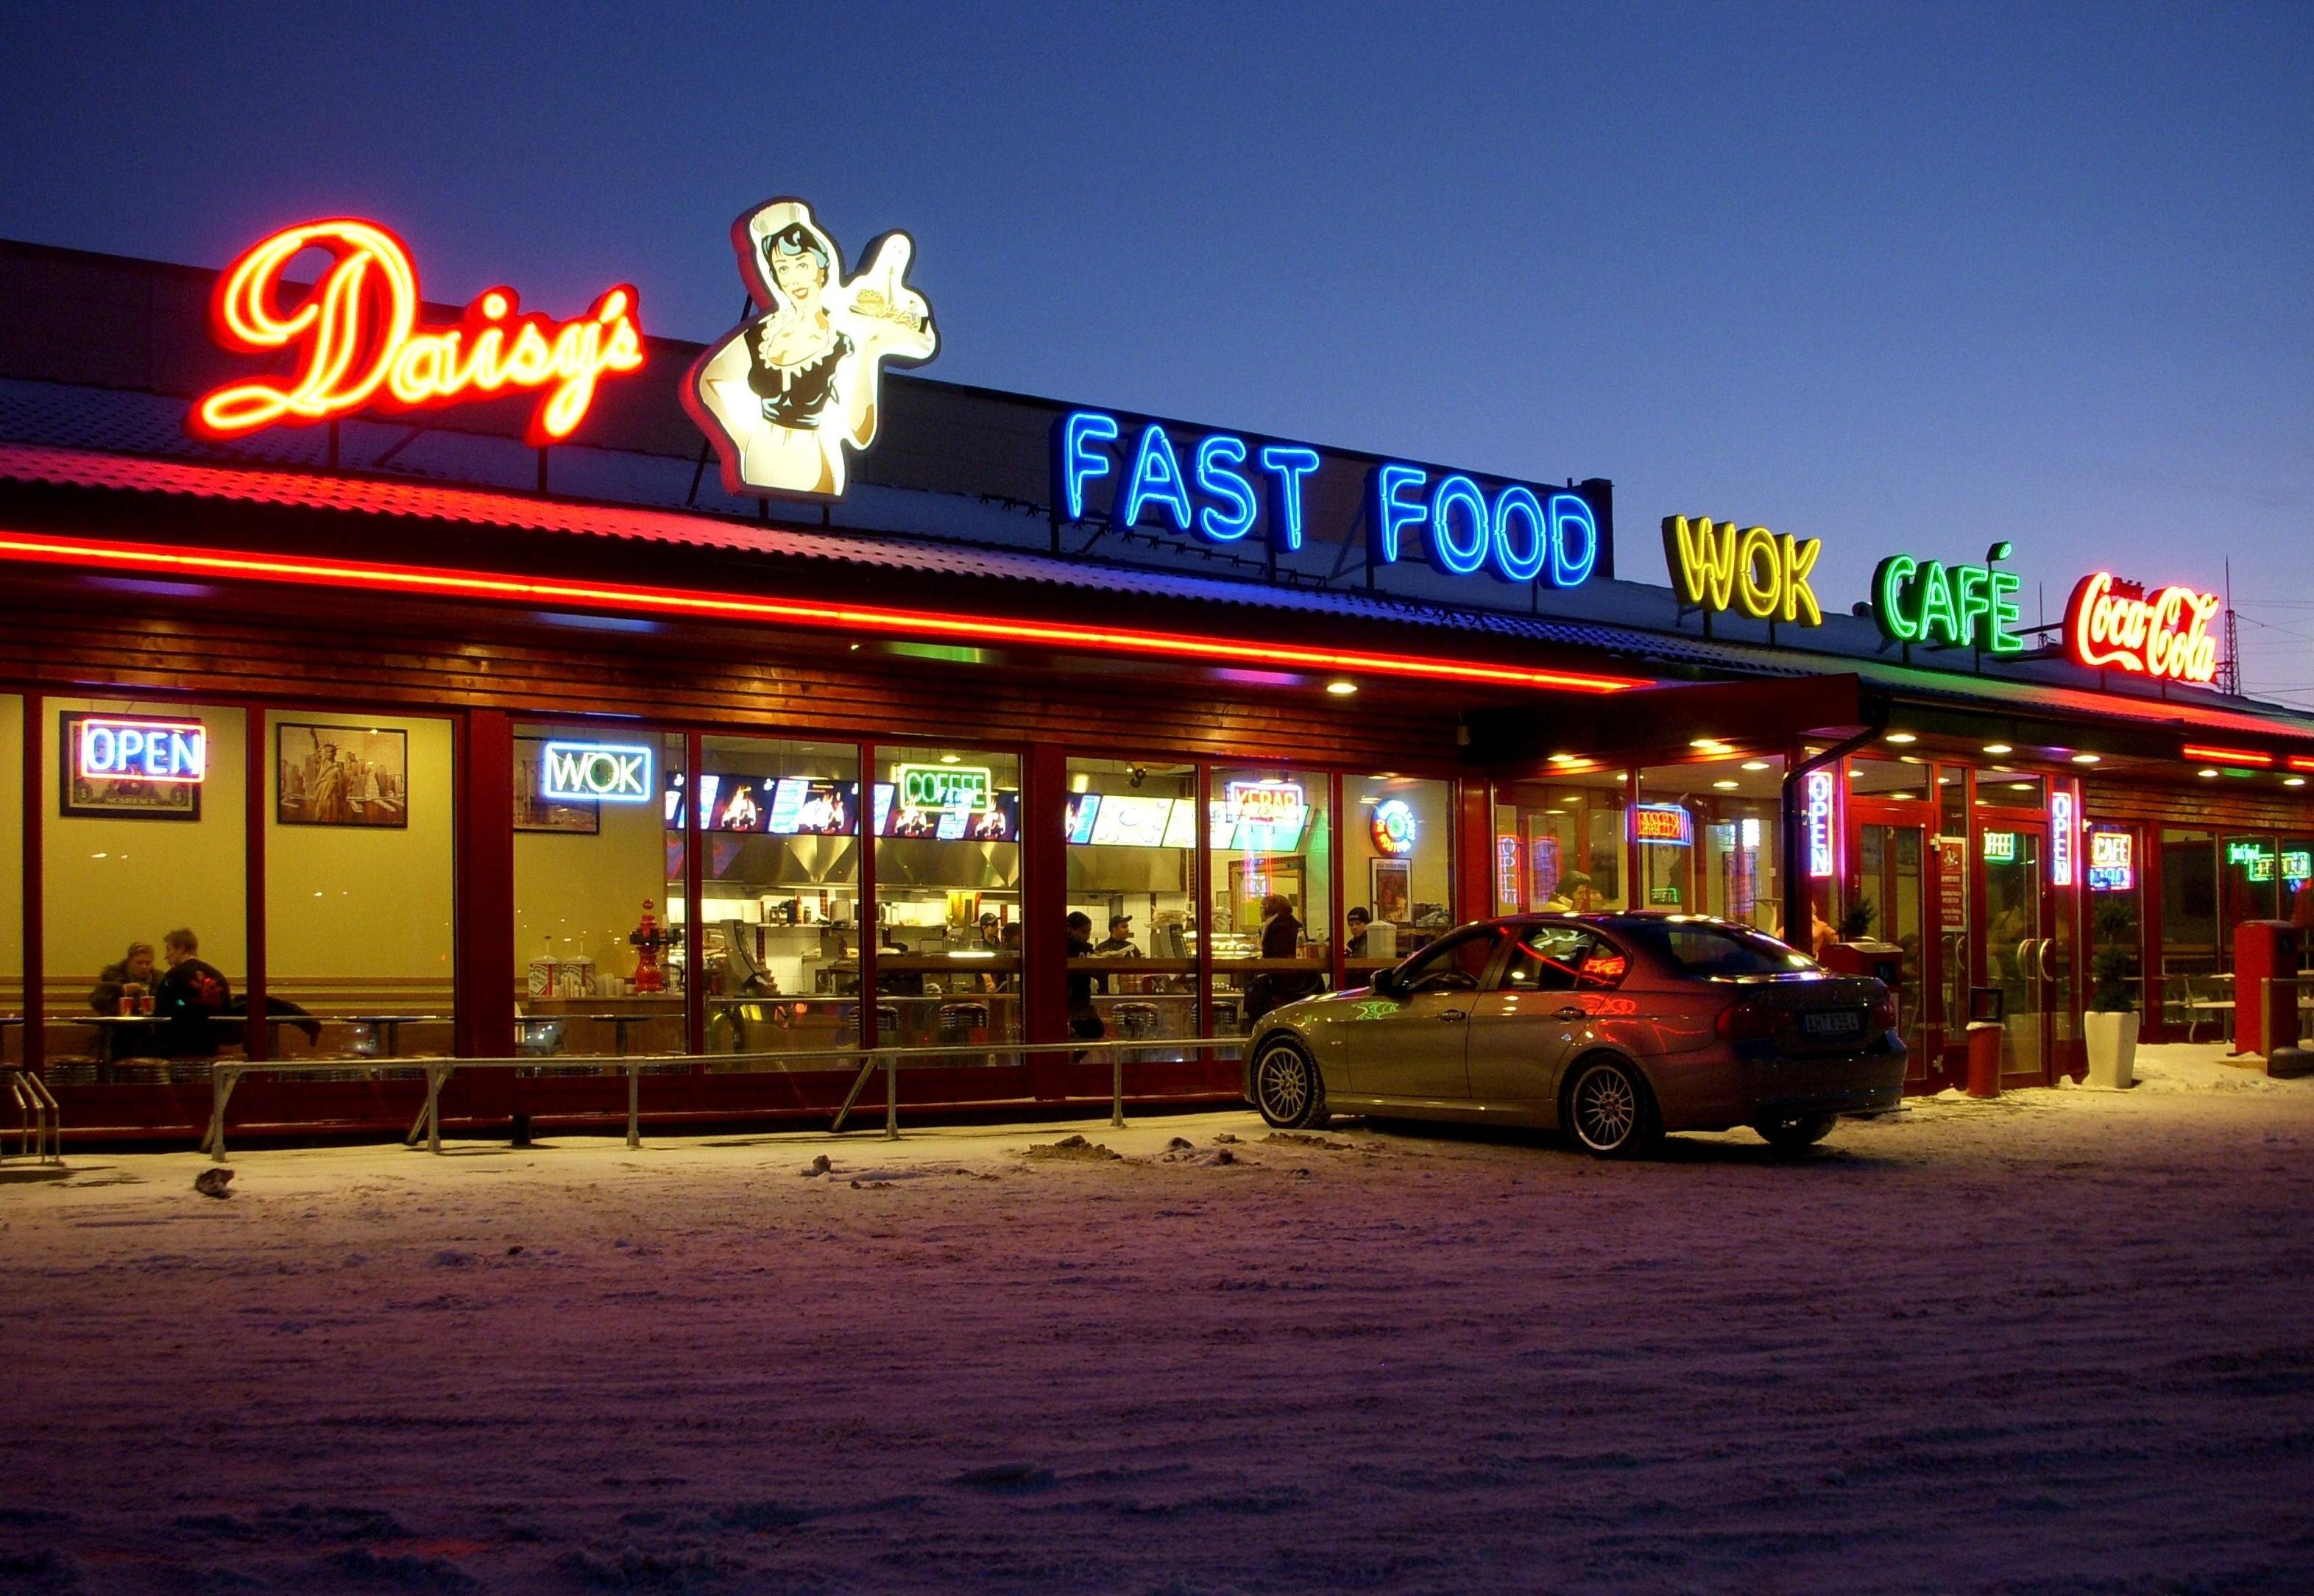 Daisy_fastfood_(3)-1